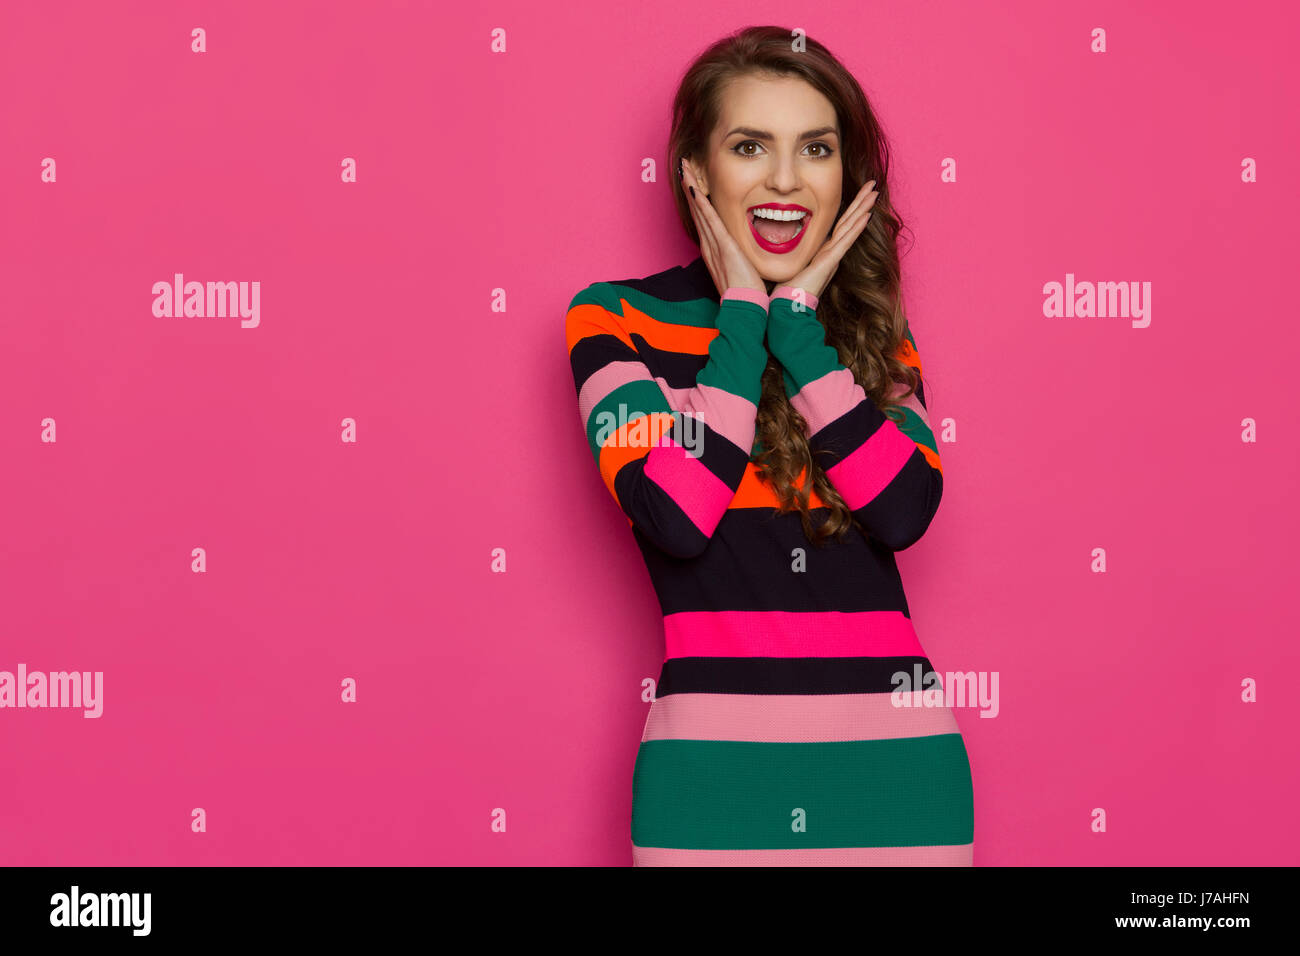 Colorful Head Dress Imágenes De Stock & Colorful Head Dress Fotos De ...